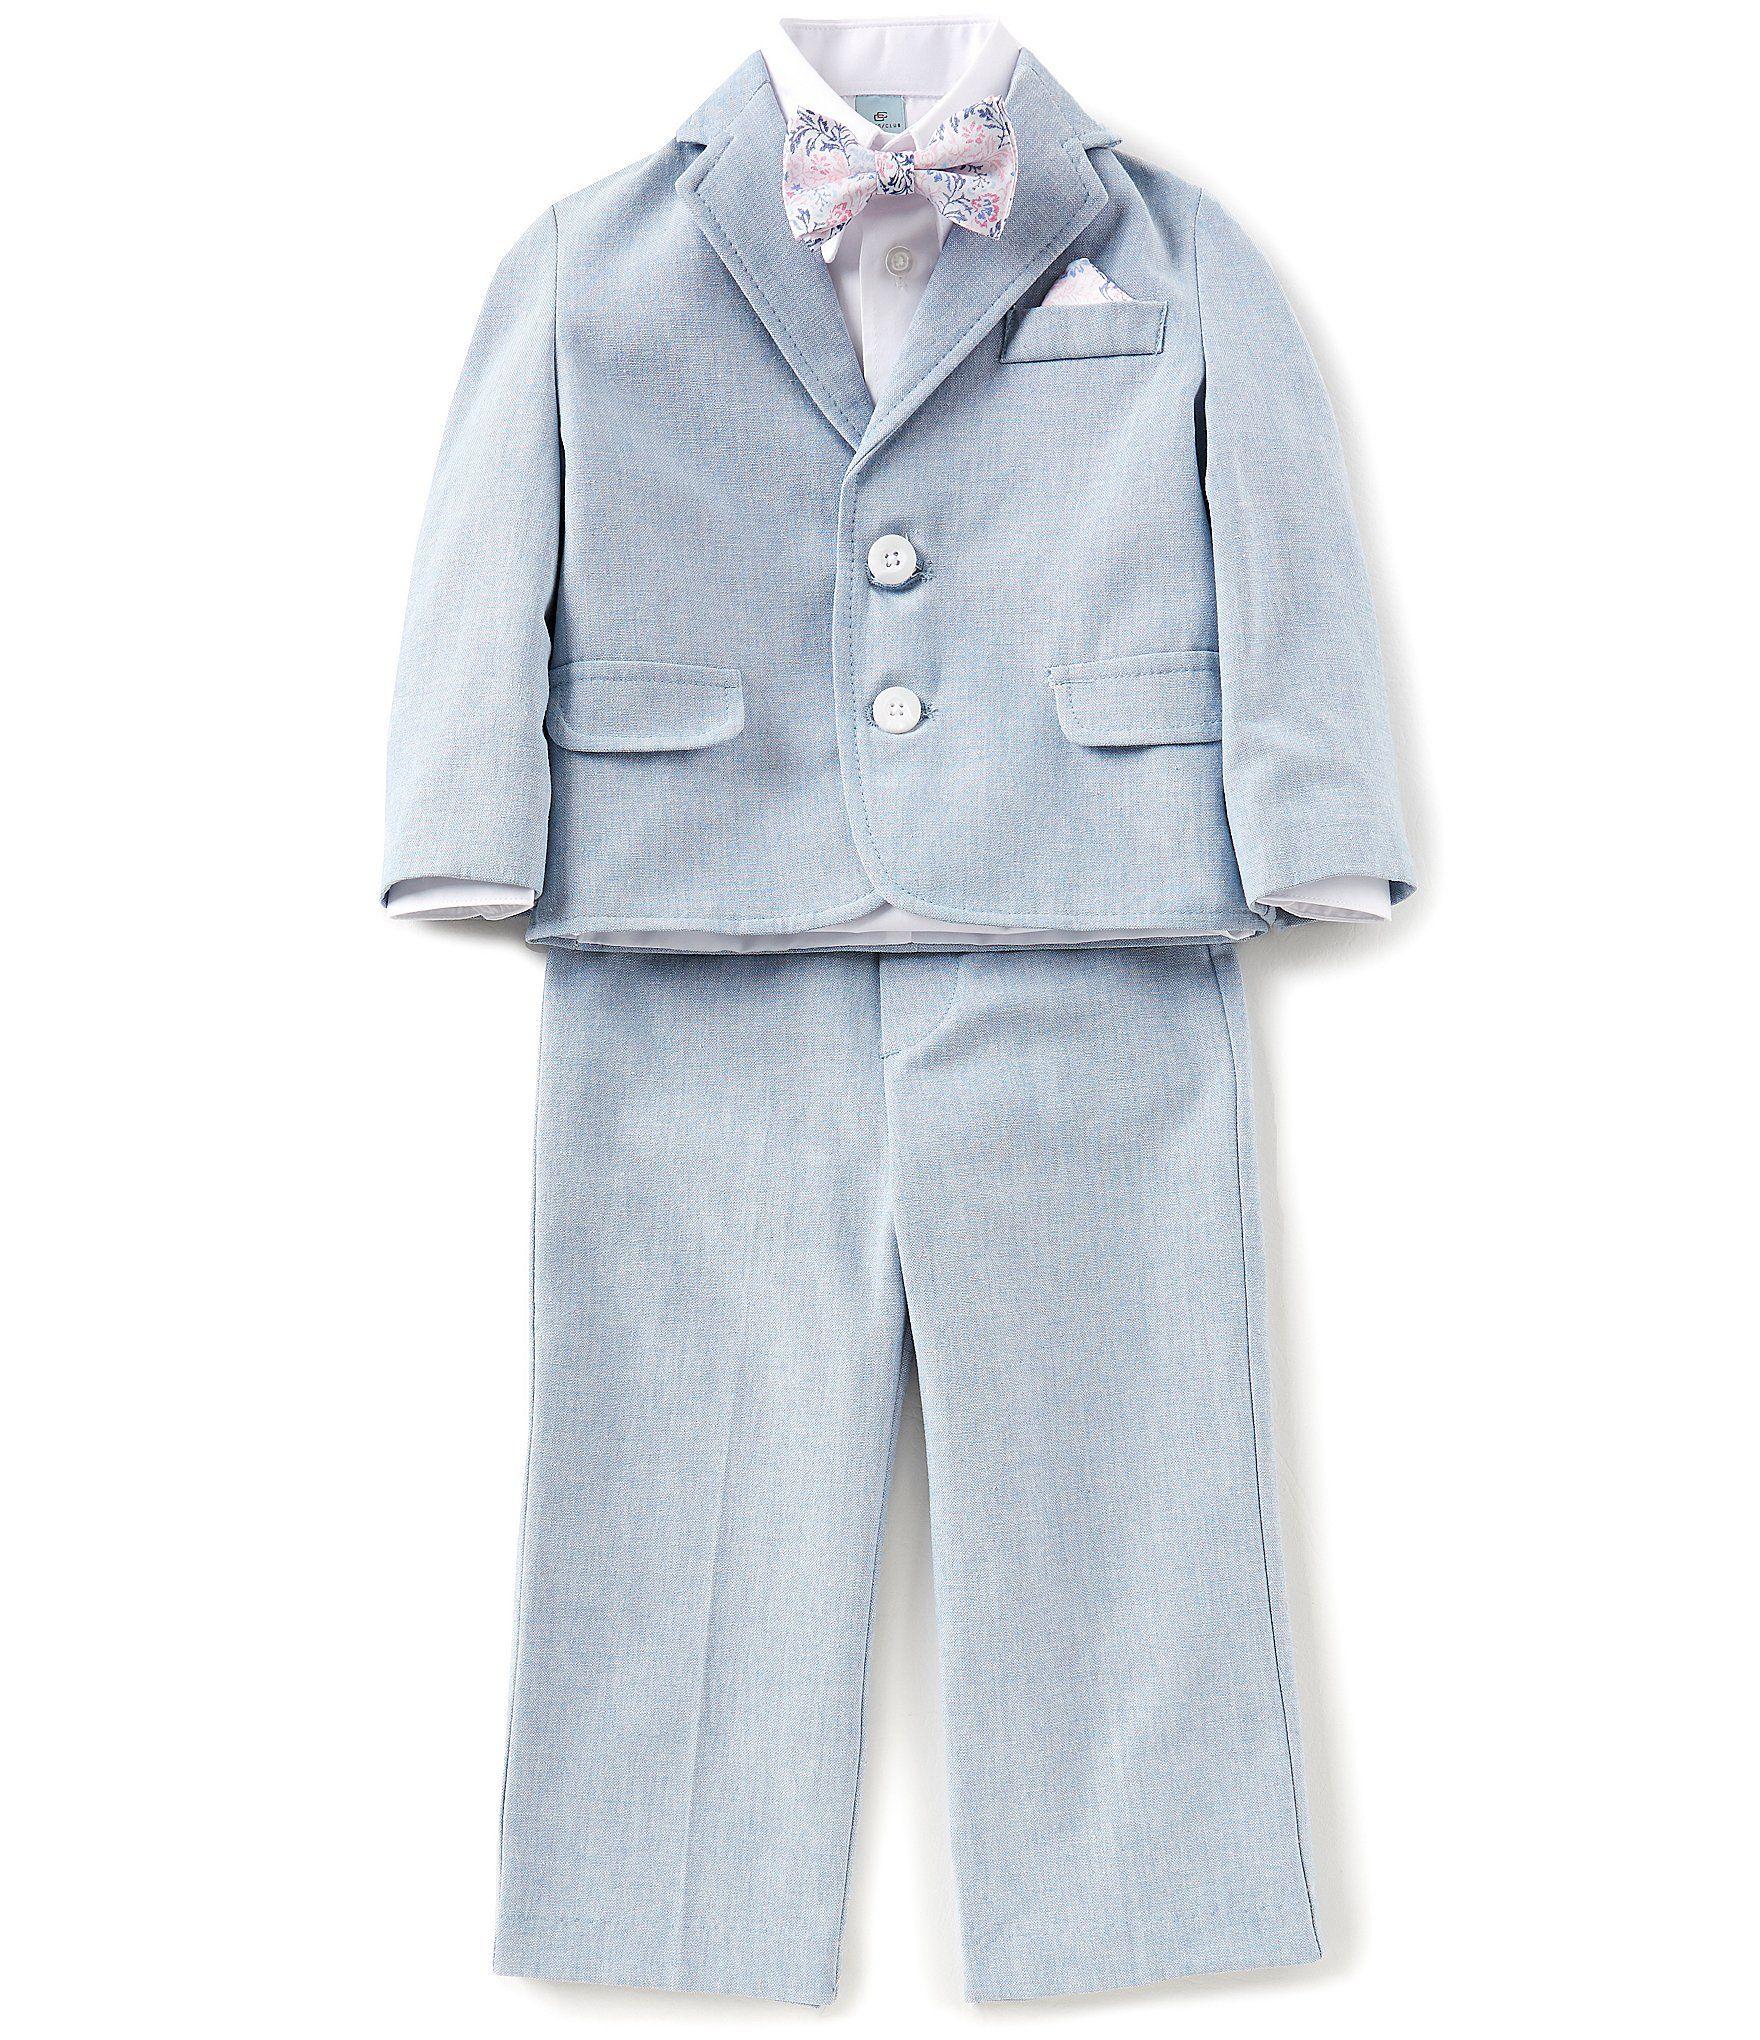 ec9112abf7ba Dusty Blue ring bearer suit baptism christening outfit - Class Club Little Boys  2T-7